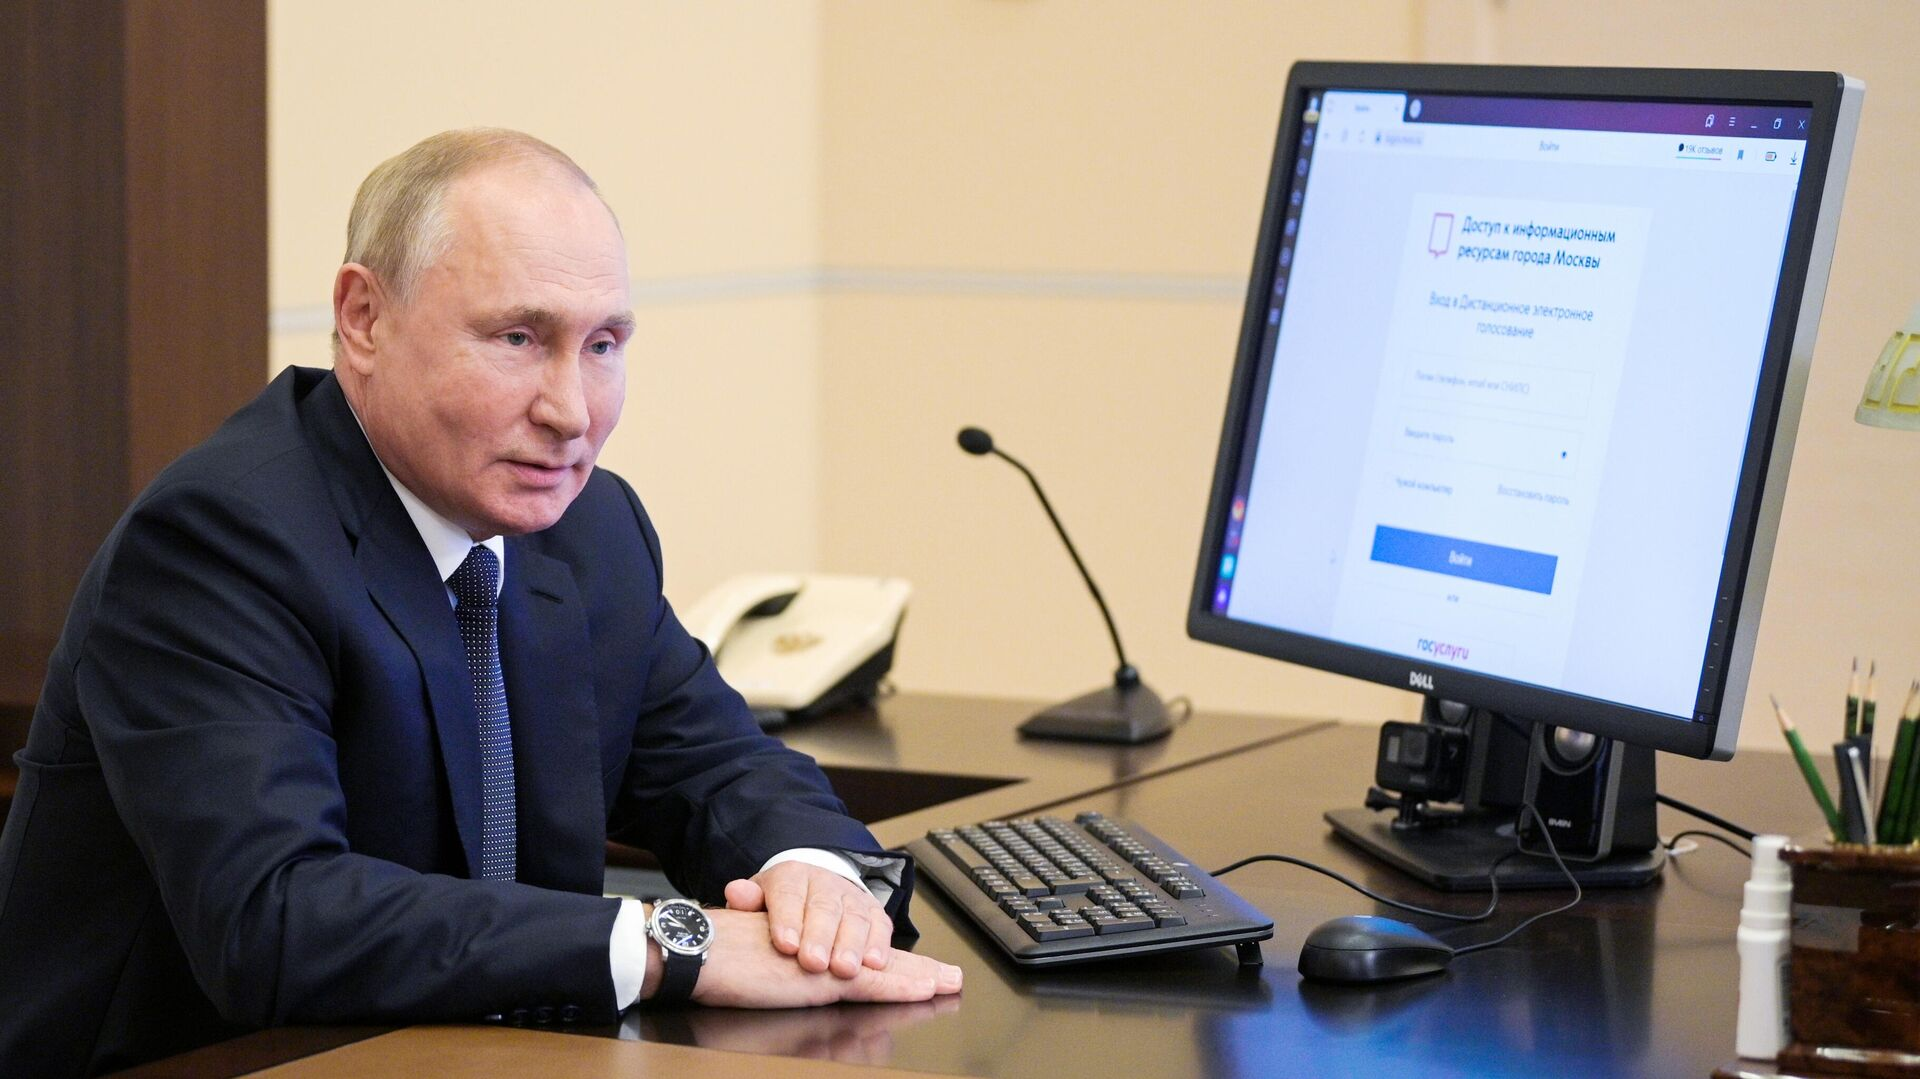 Putin vota de manera electrónica en las parlamentarias rusas - Sputnik Mundo, 1920, 17.09.2021